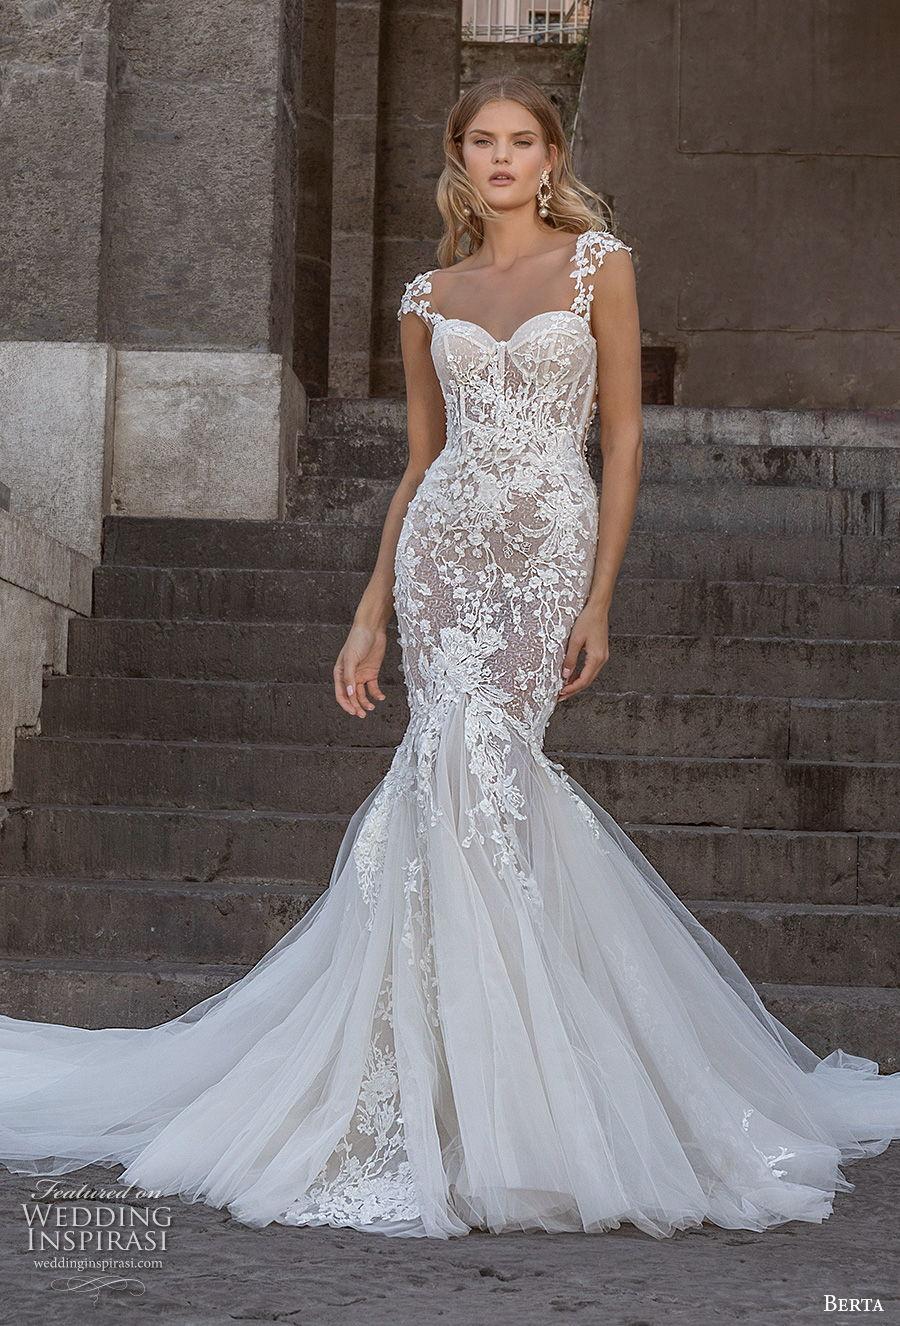 berta fall 2020 bridal cap sleeves sweetheart neckline heavily embellished bodice bustier elegant mermaid wedding dress backless low back royal train (16) mv